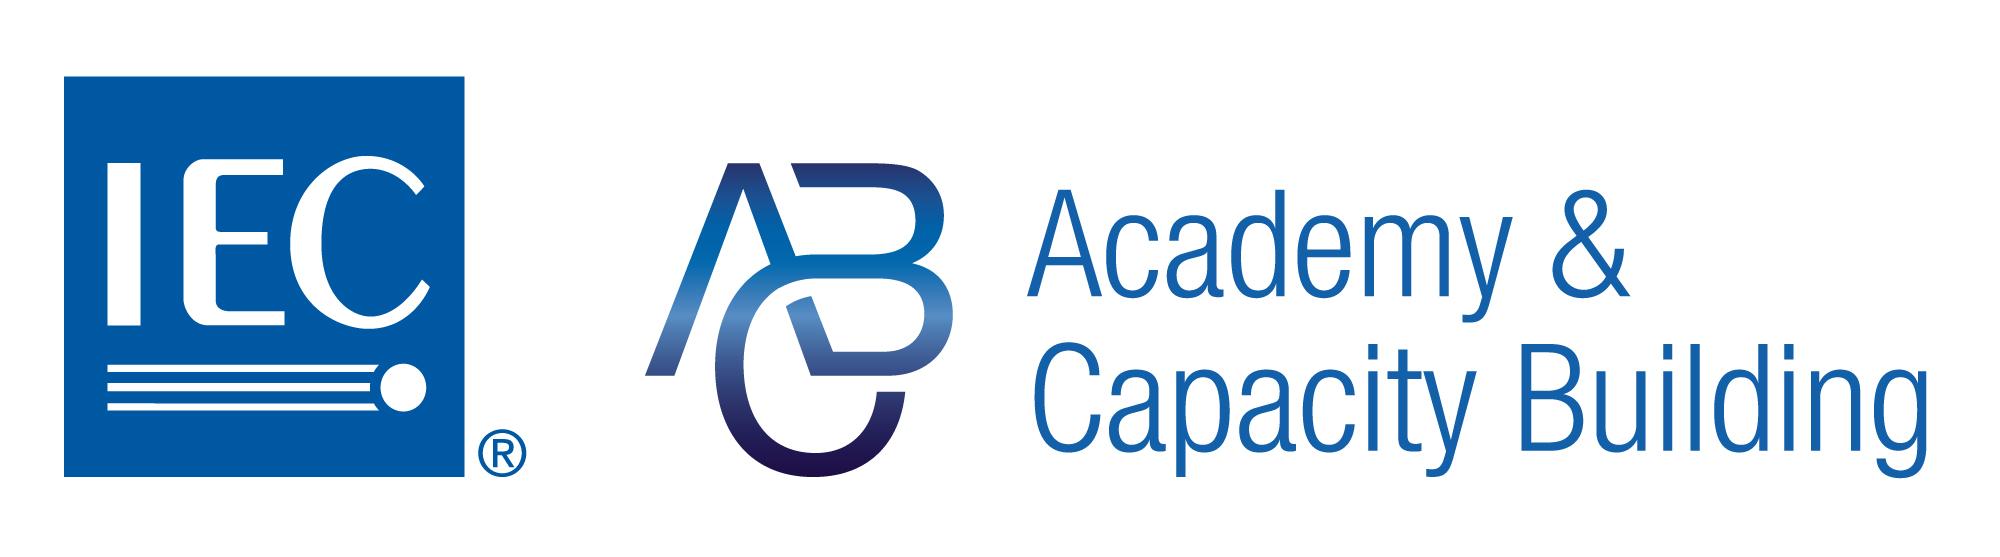 ACB visual identity